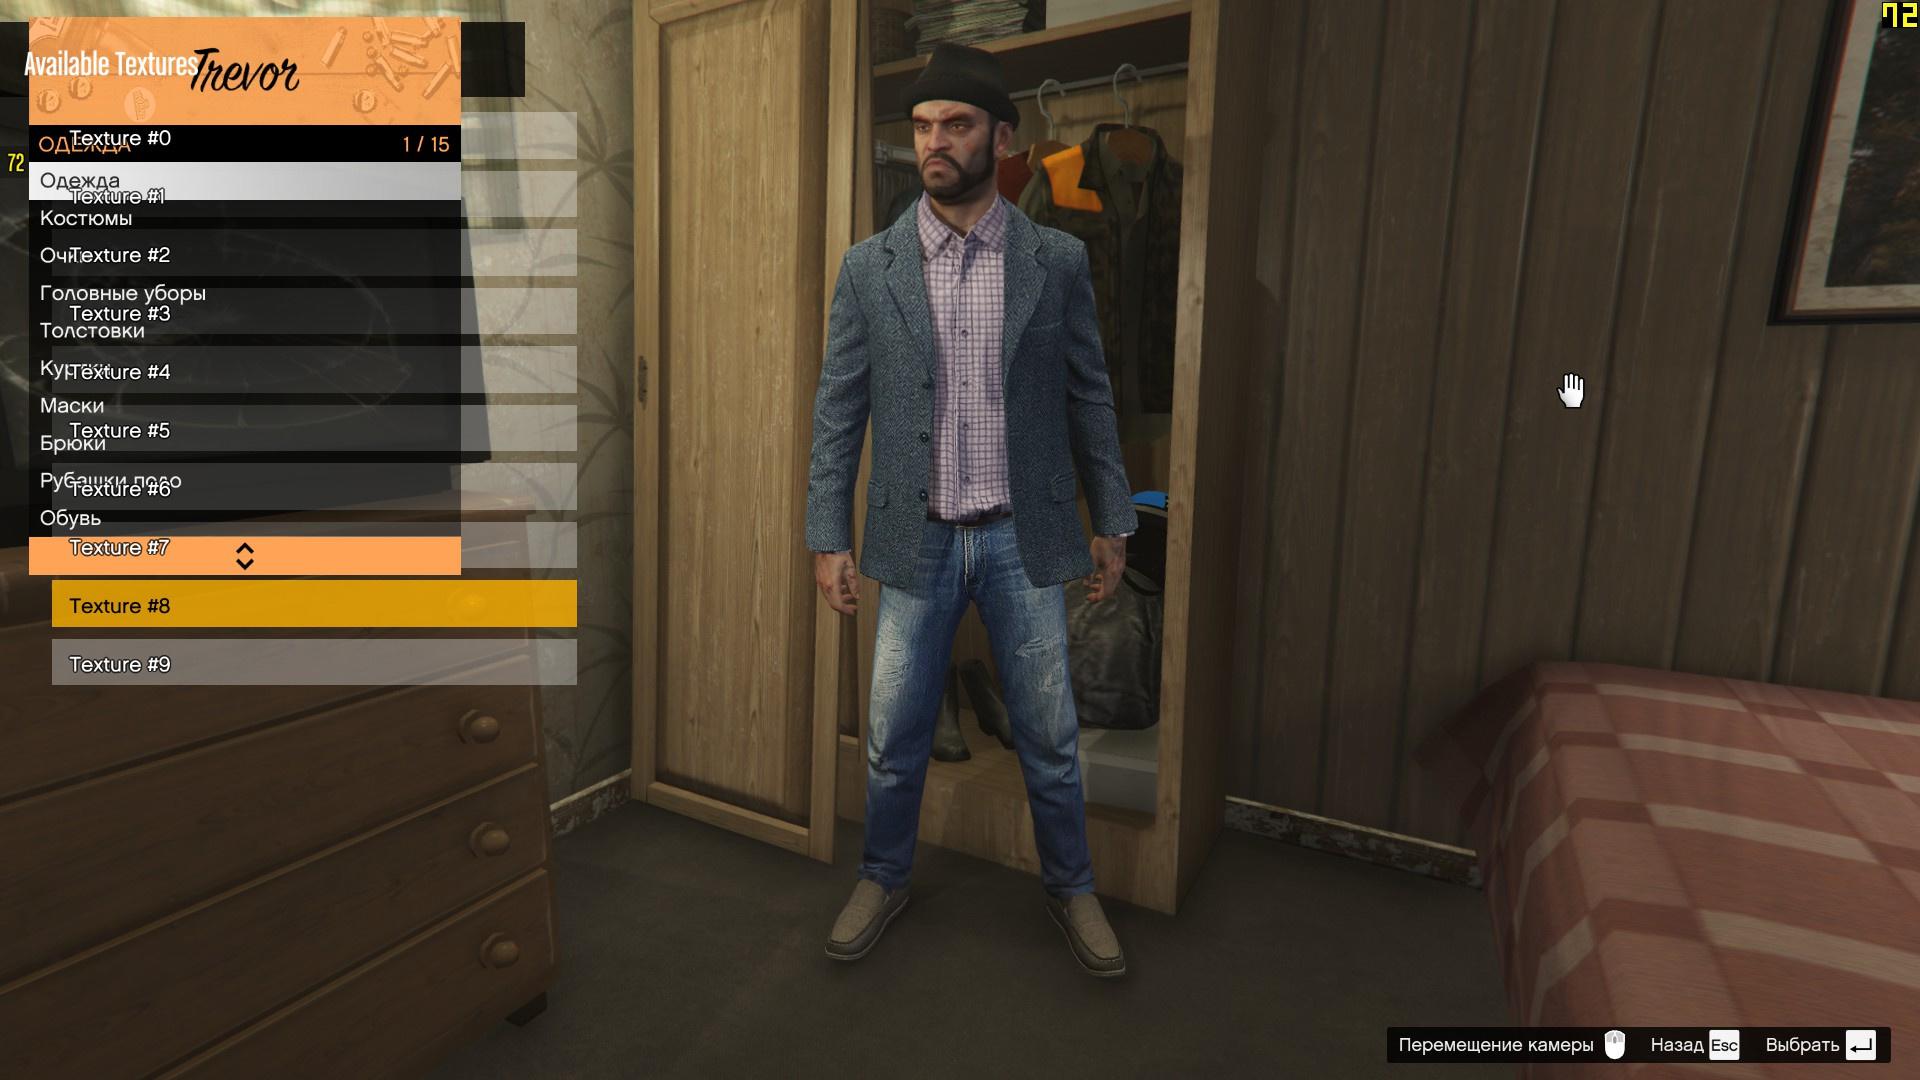 Nijel upper suit for Trevor, Michael